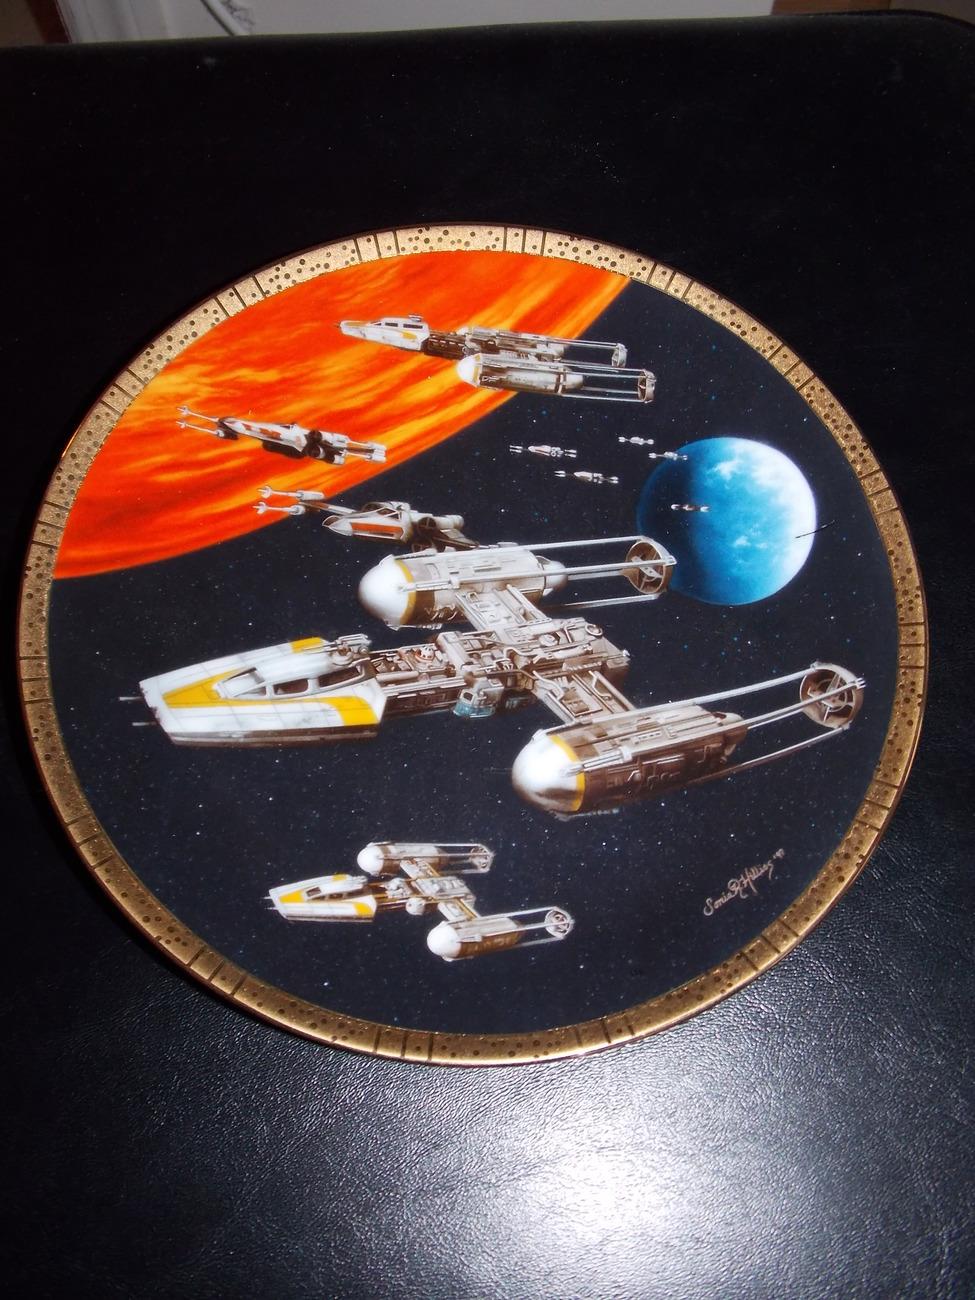 Star wars plates 010